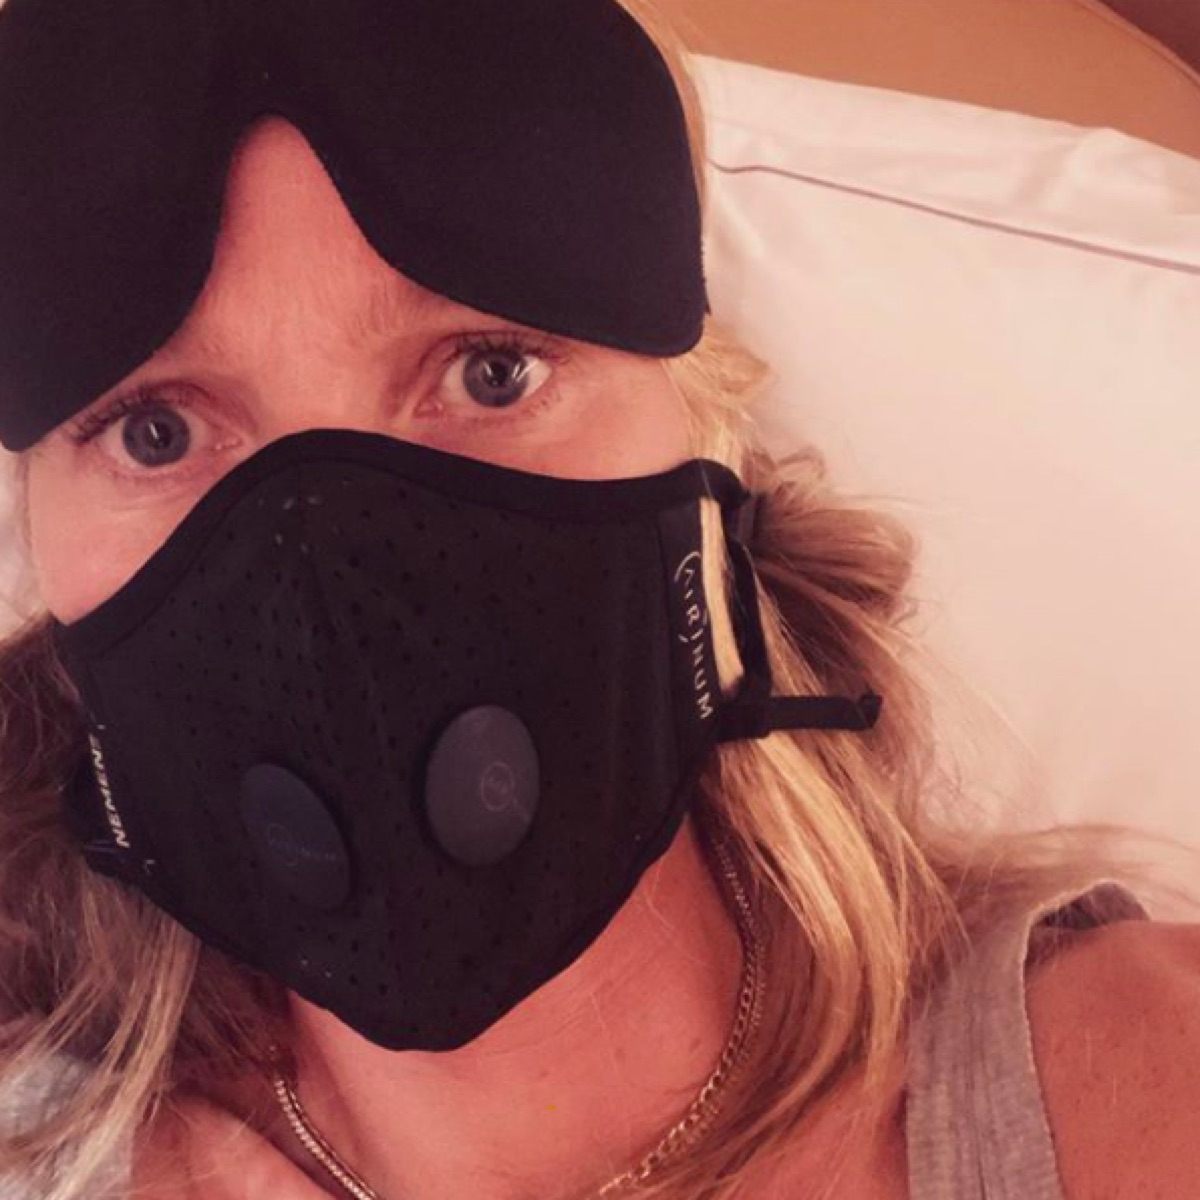 Gwyneth Patrow Instagram mask selfie